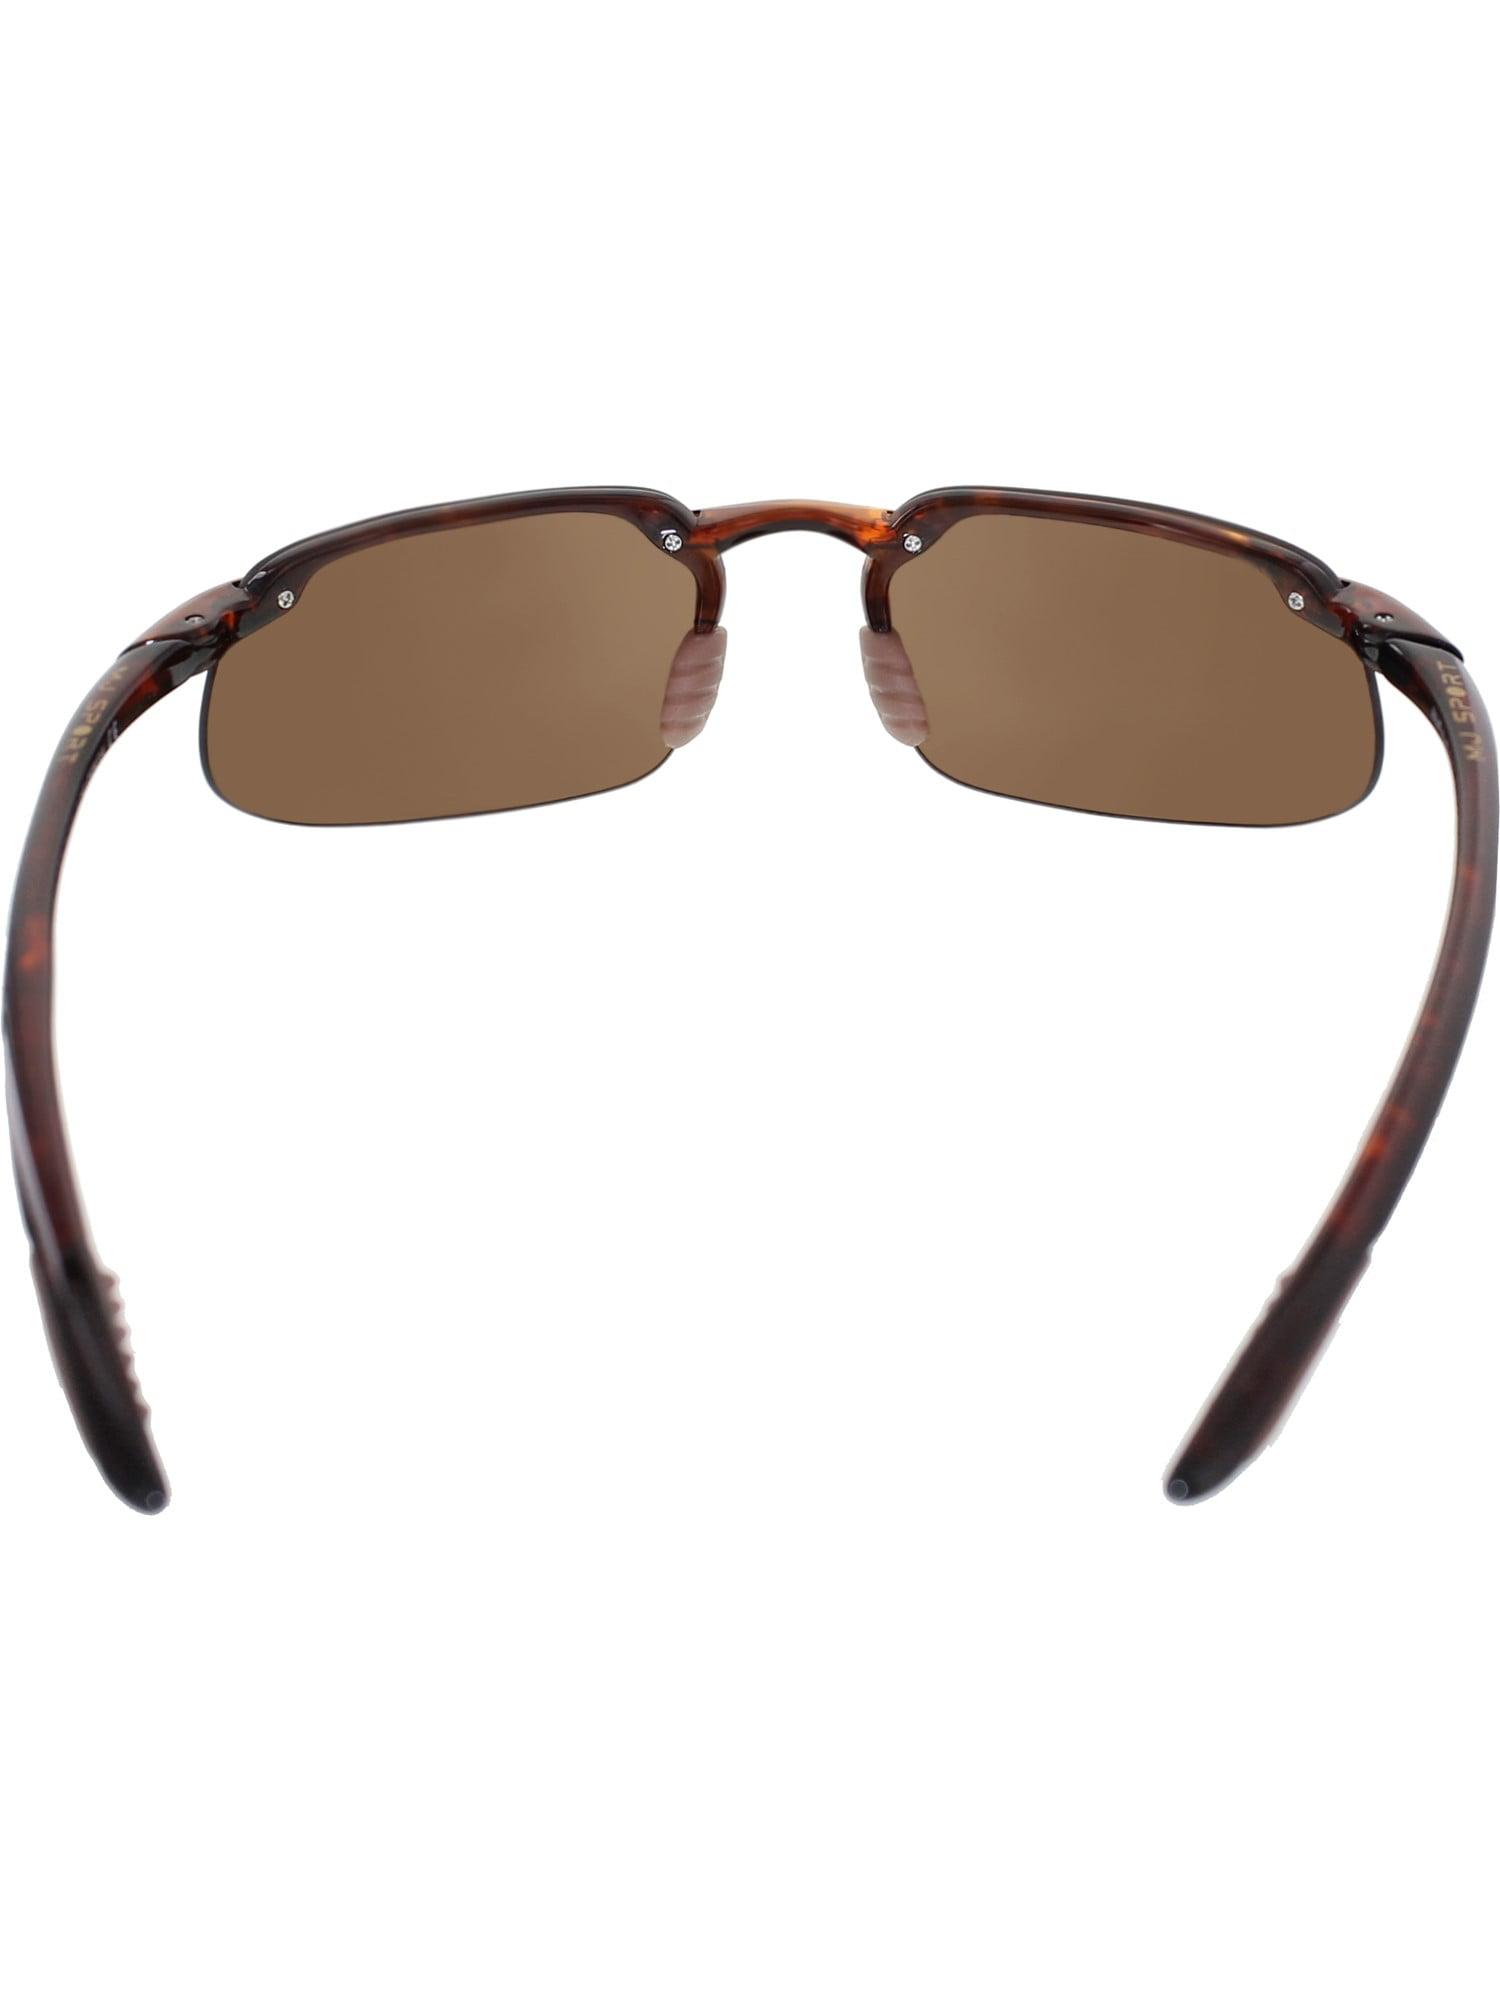 dee56badbc96e Maui Jim - Maui Jim Men s Polarized Kanaha H409-10 Tortoiseshell  Semi-Rimless Sunglasses - Walmart.com